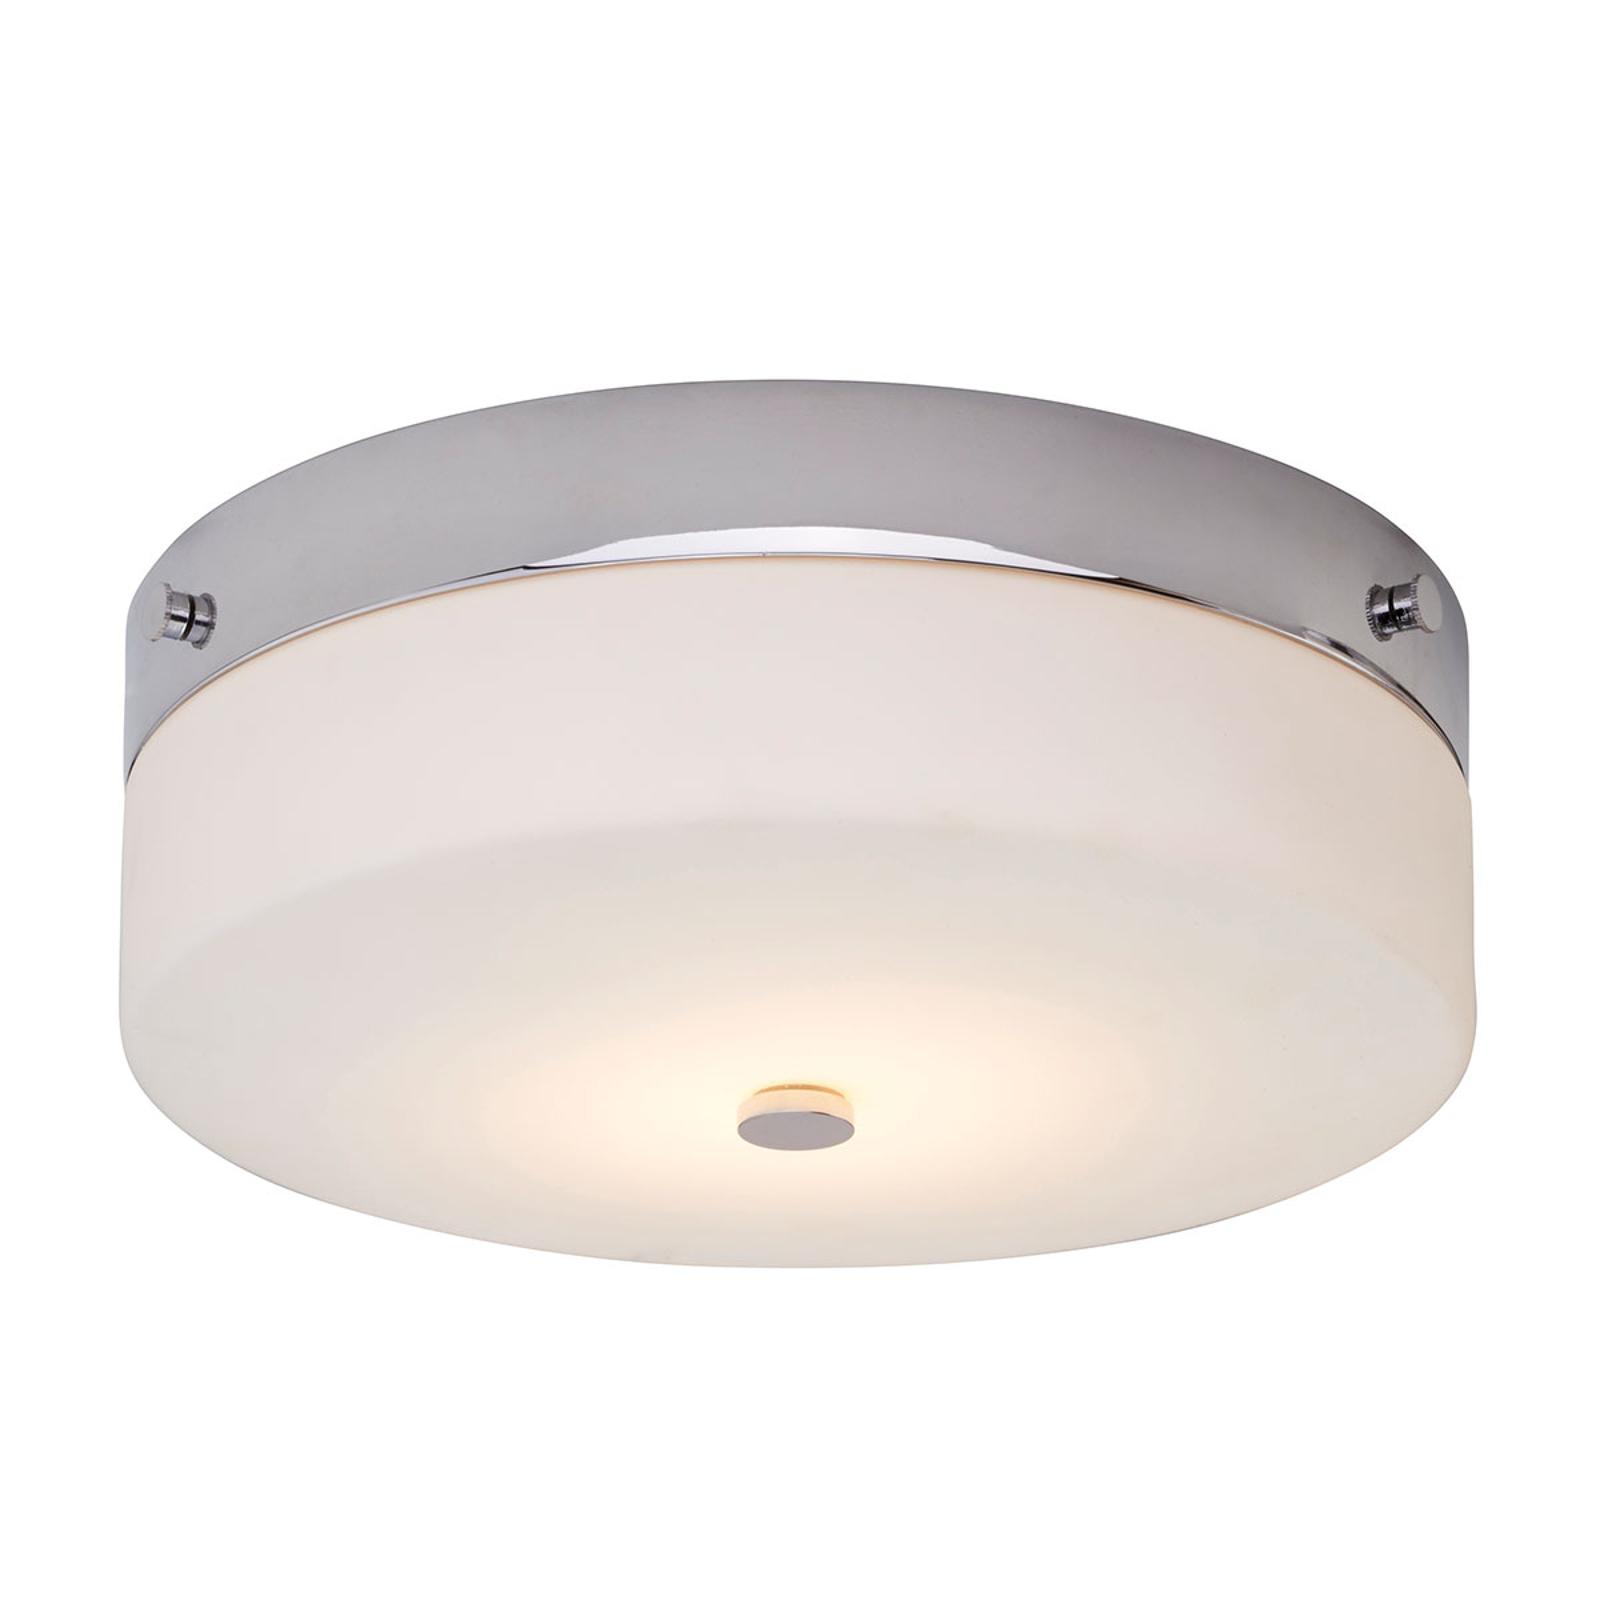 Ponadczasowo piękna lampa sufitowa LED Tamar, IP44